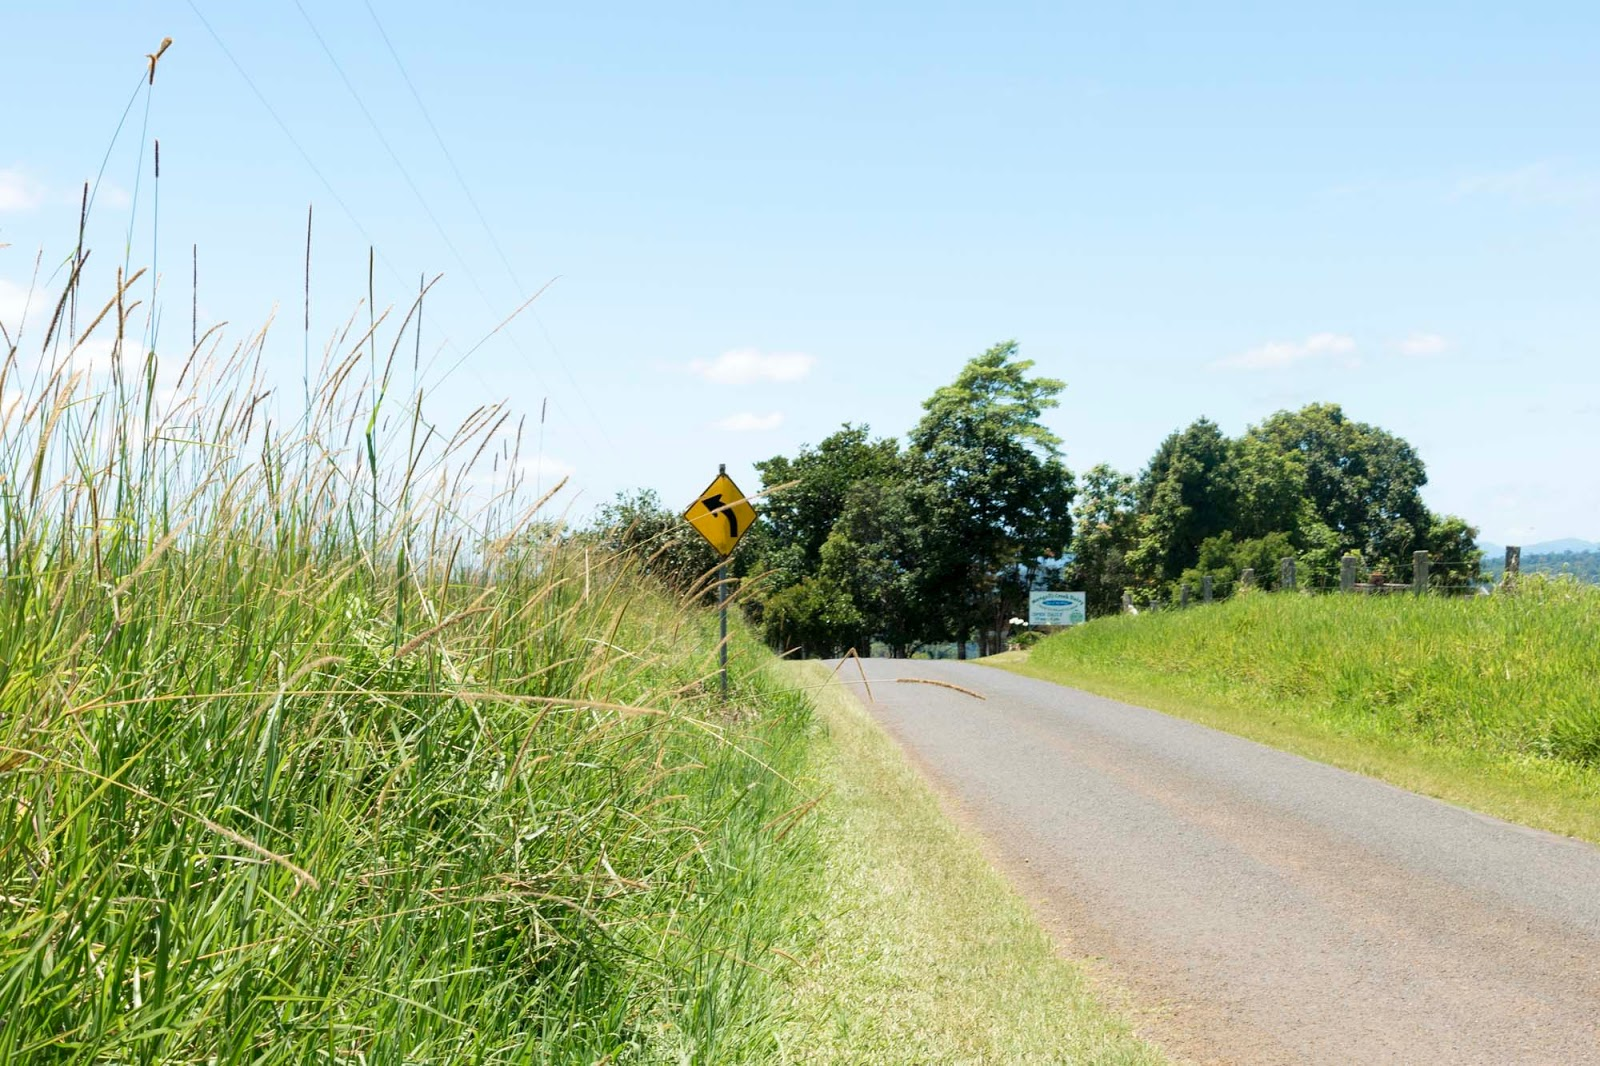 driving through the atherton tablelands